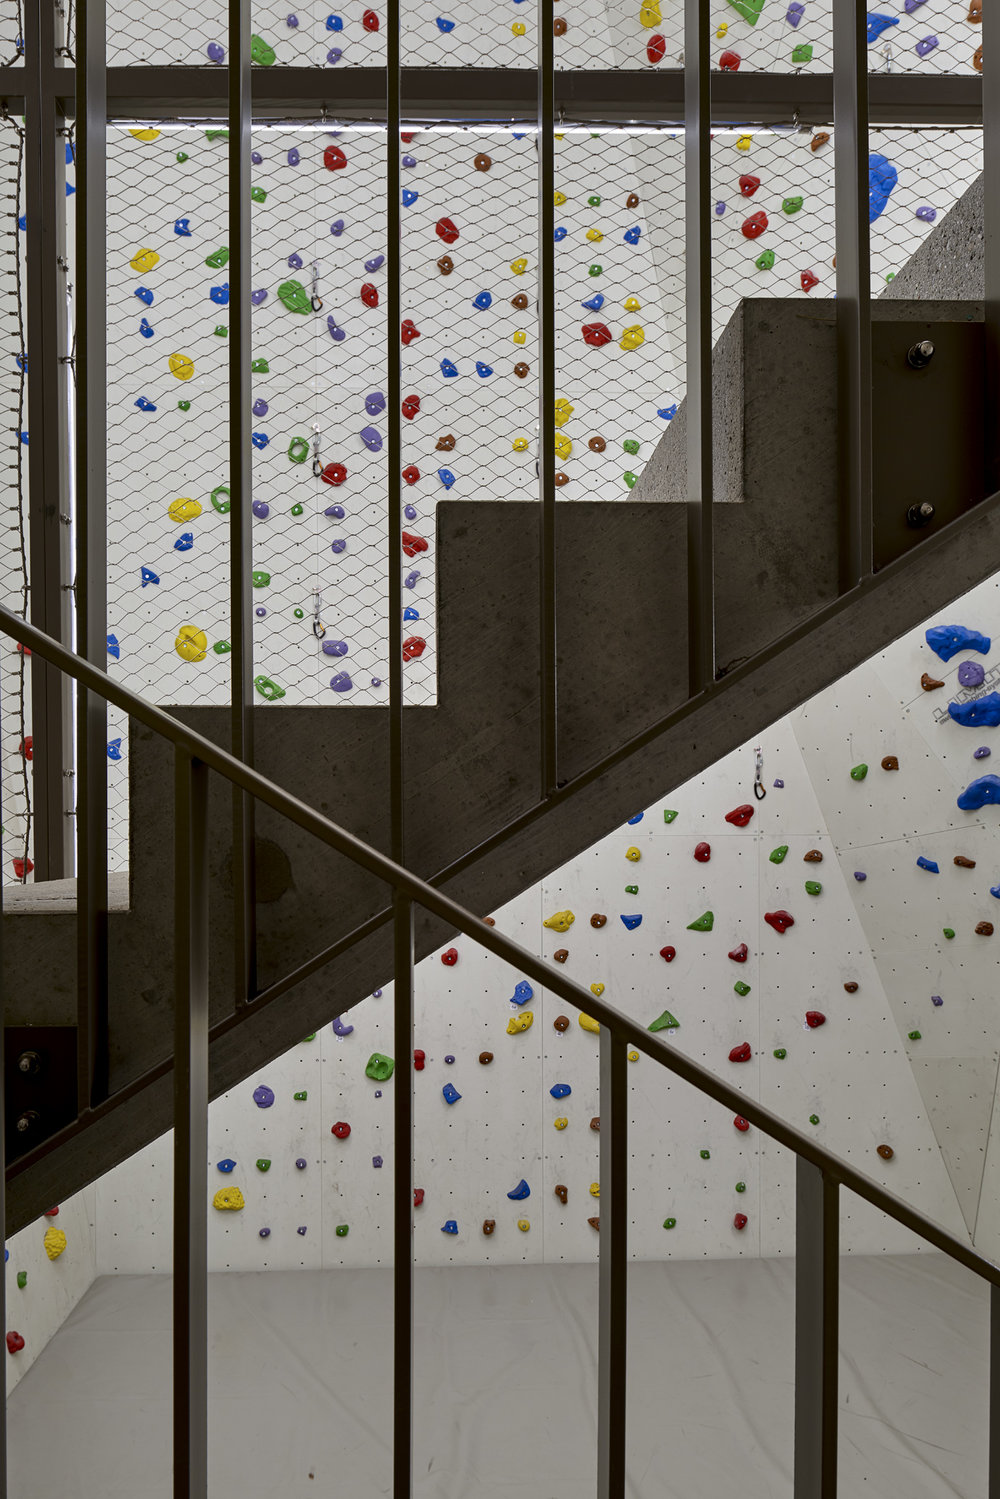 dettling péléraux architectes_017.jpg